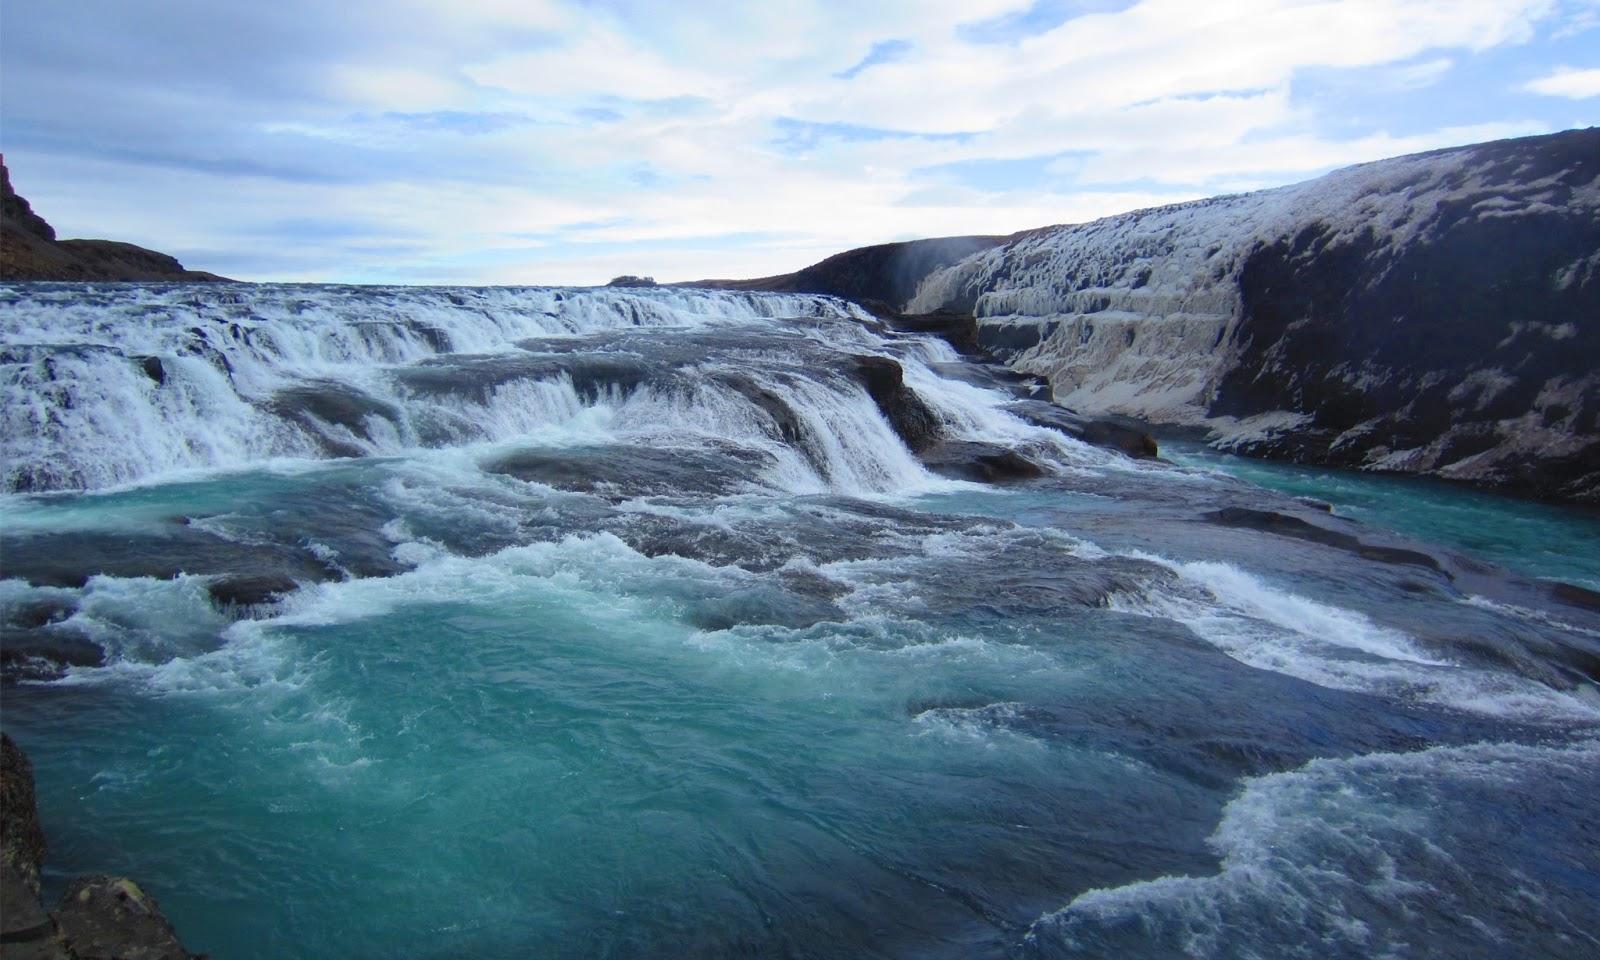 Iceland 1080p Hd Wallpapers Logberg 1600x960 Download Hd Wallpaper Wallpapertip